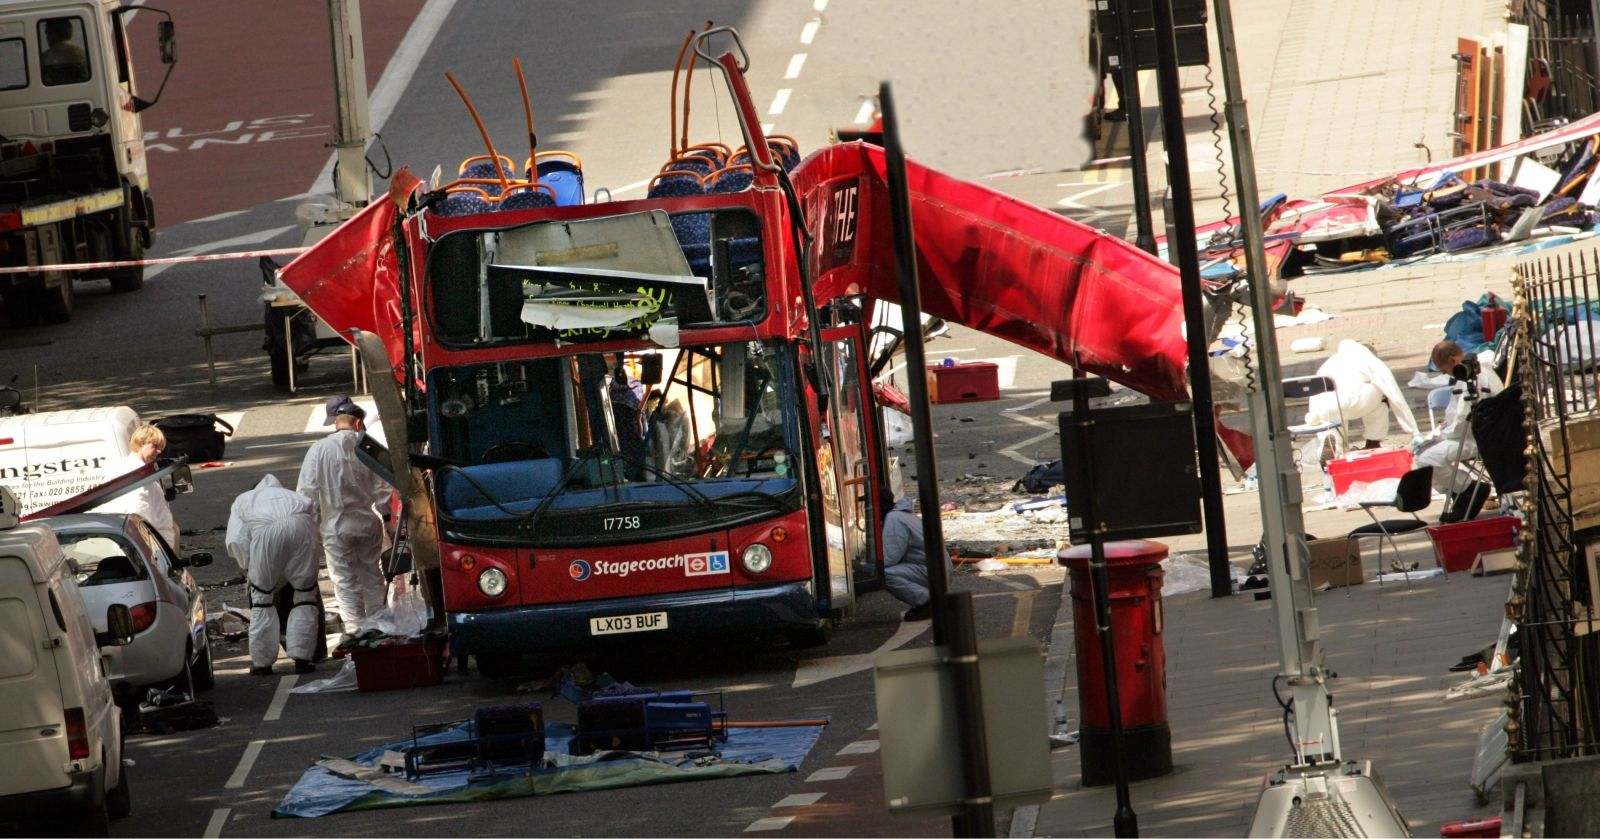 London's Terror Protocols: The Plan for the Next Terrorism